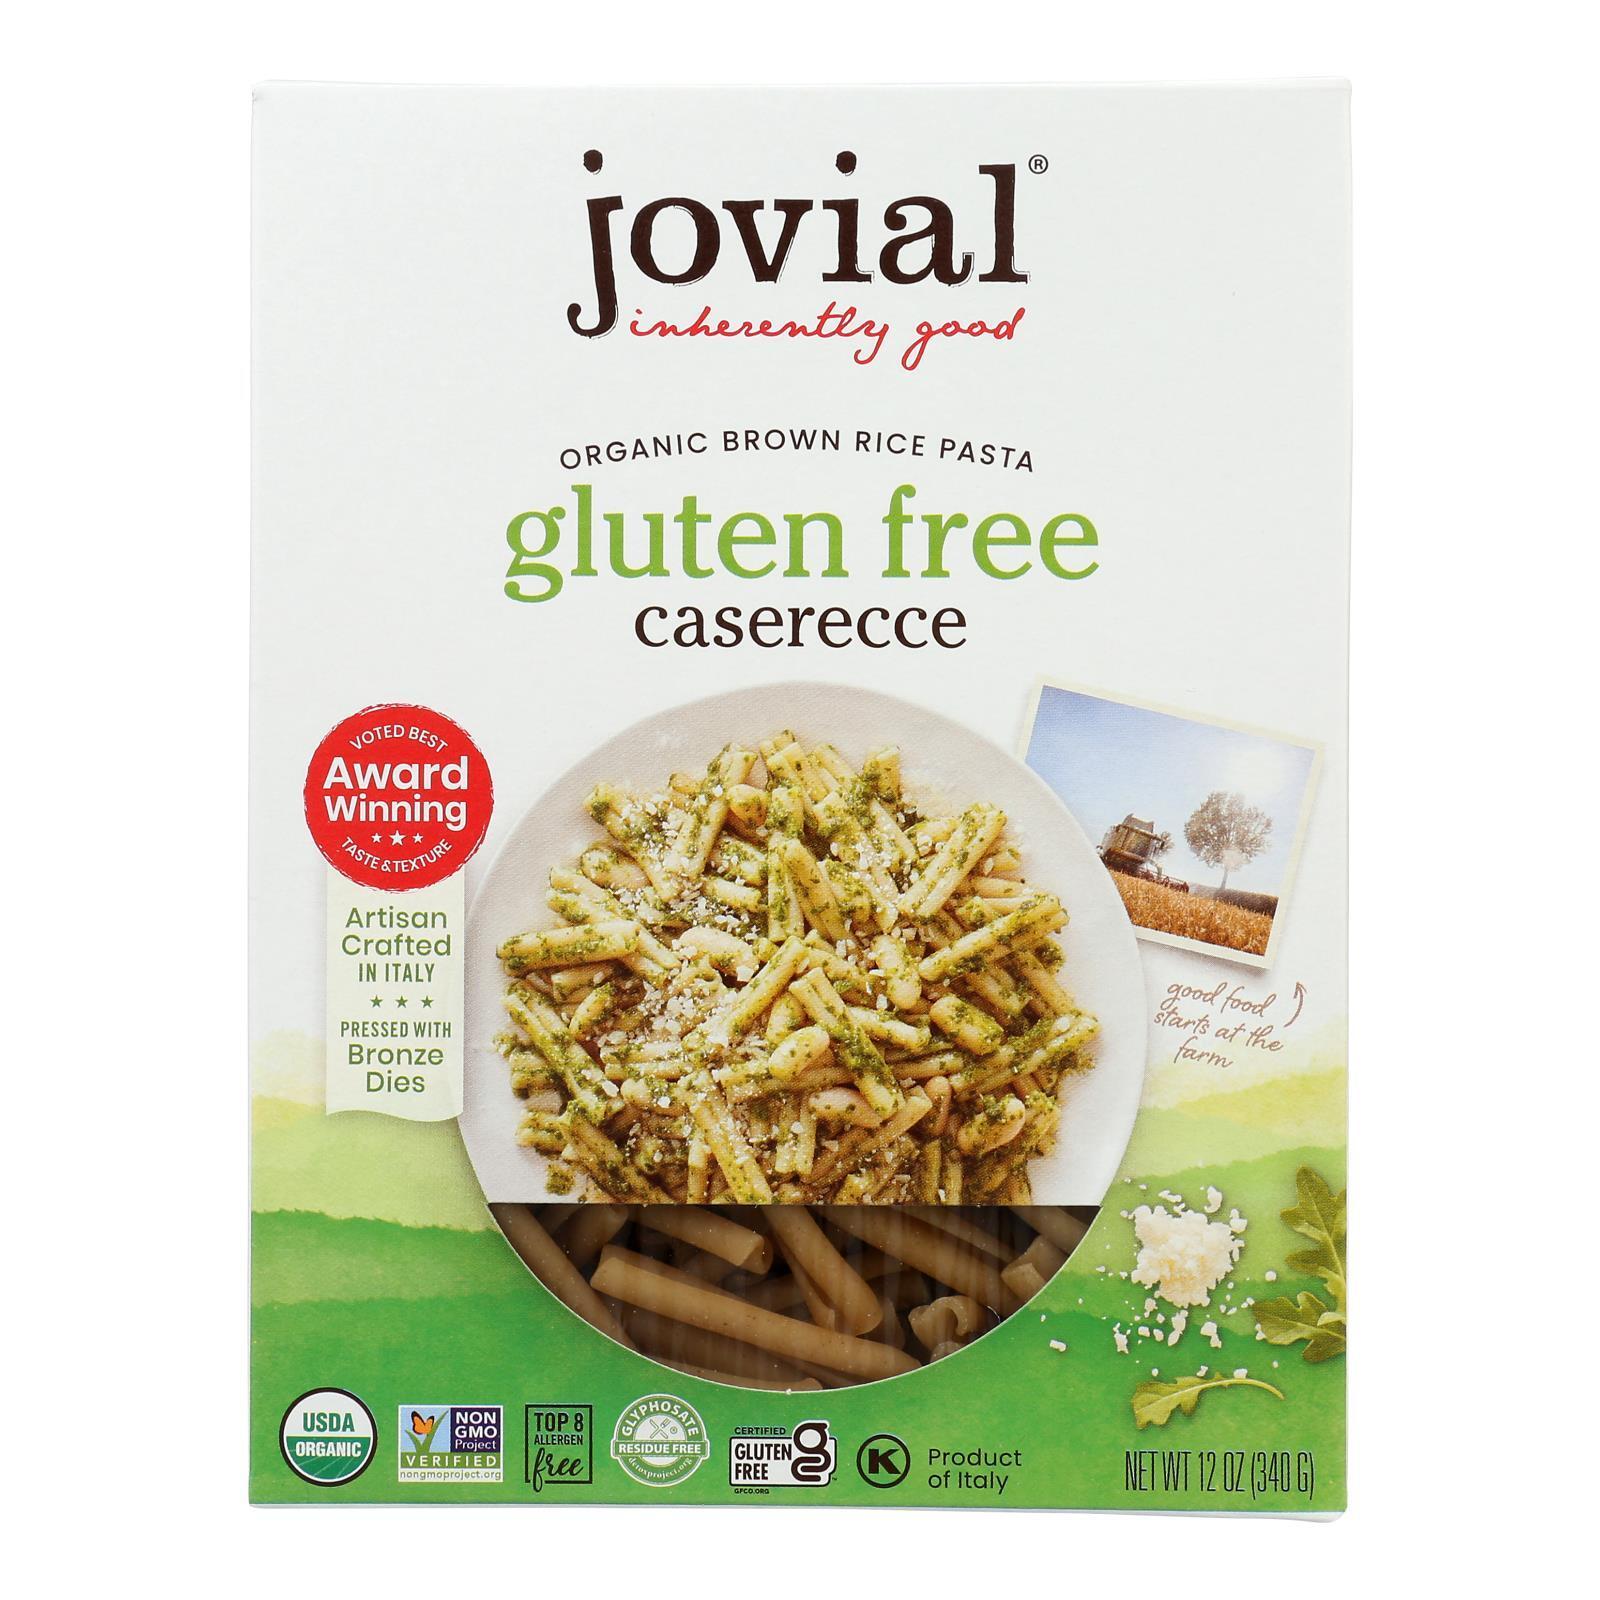 Jovial Gluten Free Brown Rice Pasta - Caserecce - Case of 12 - 12 oz.